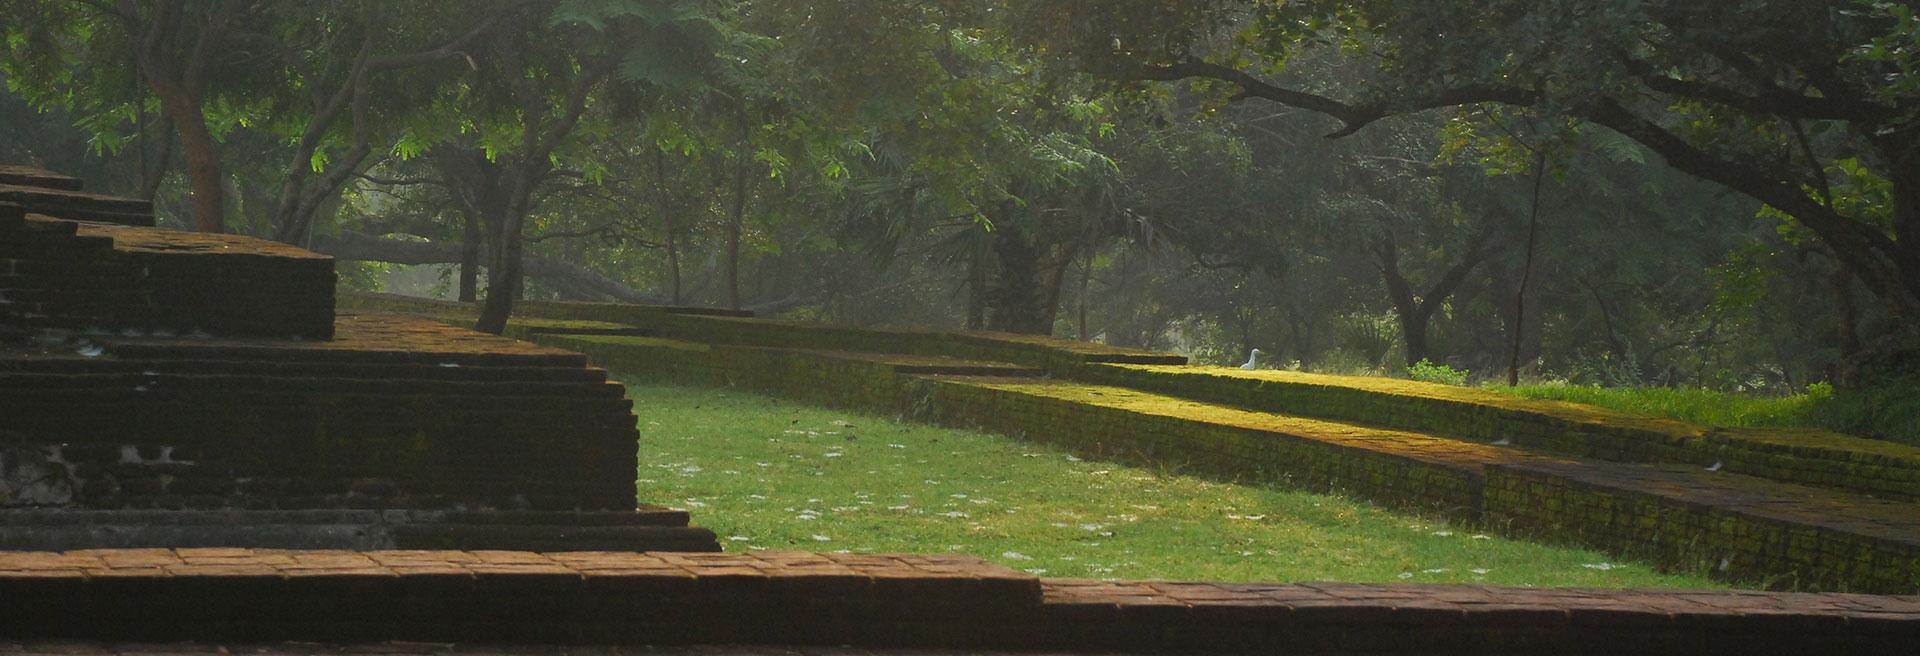 Polonnaruwa Excursion